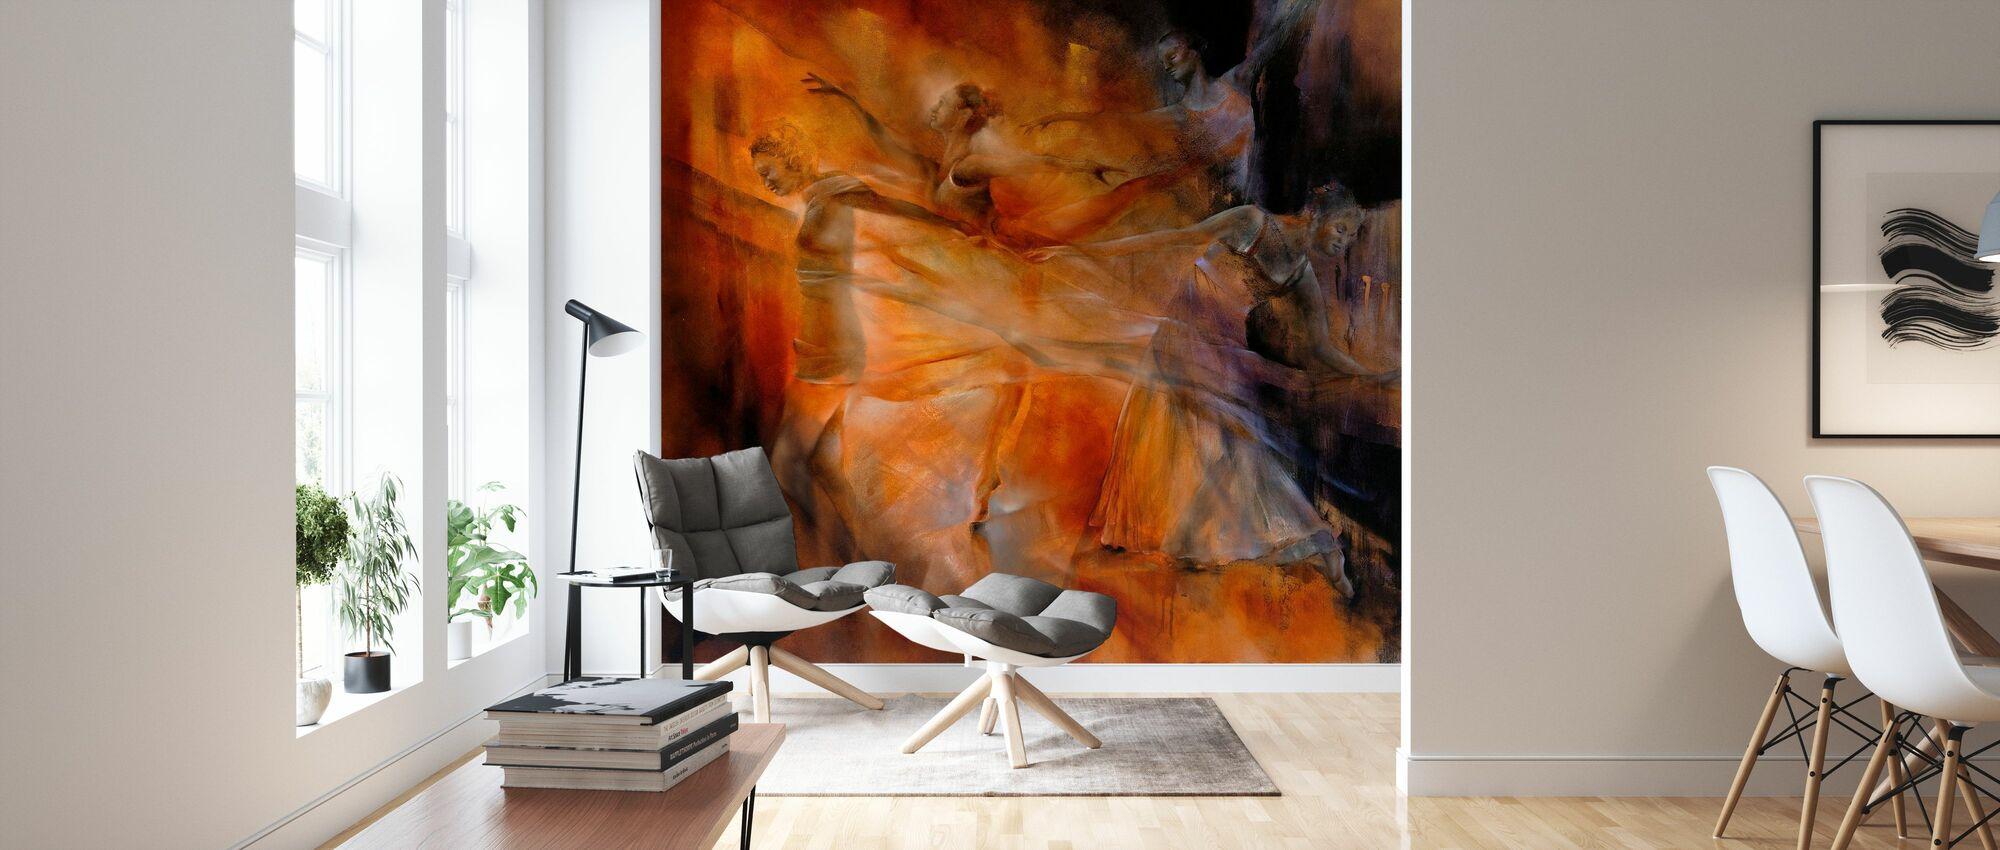 Balance Four Dancers - Wallpaper - Living Room